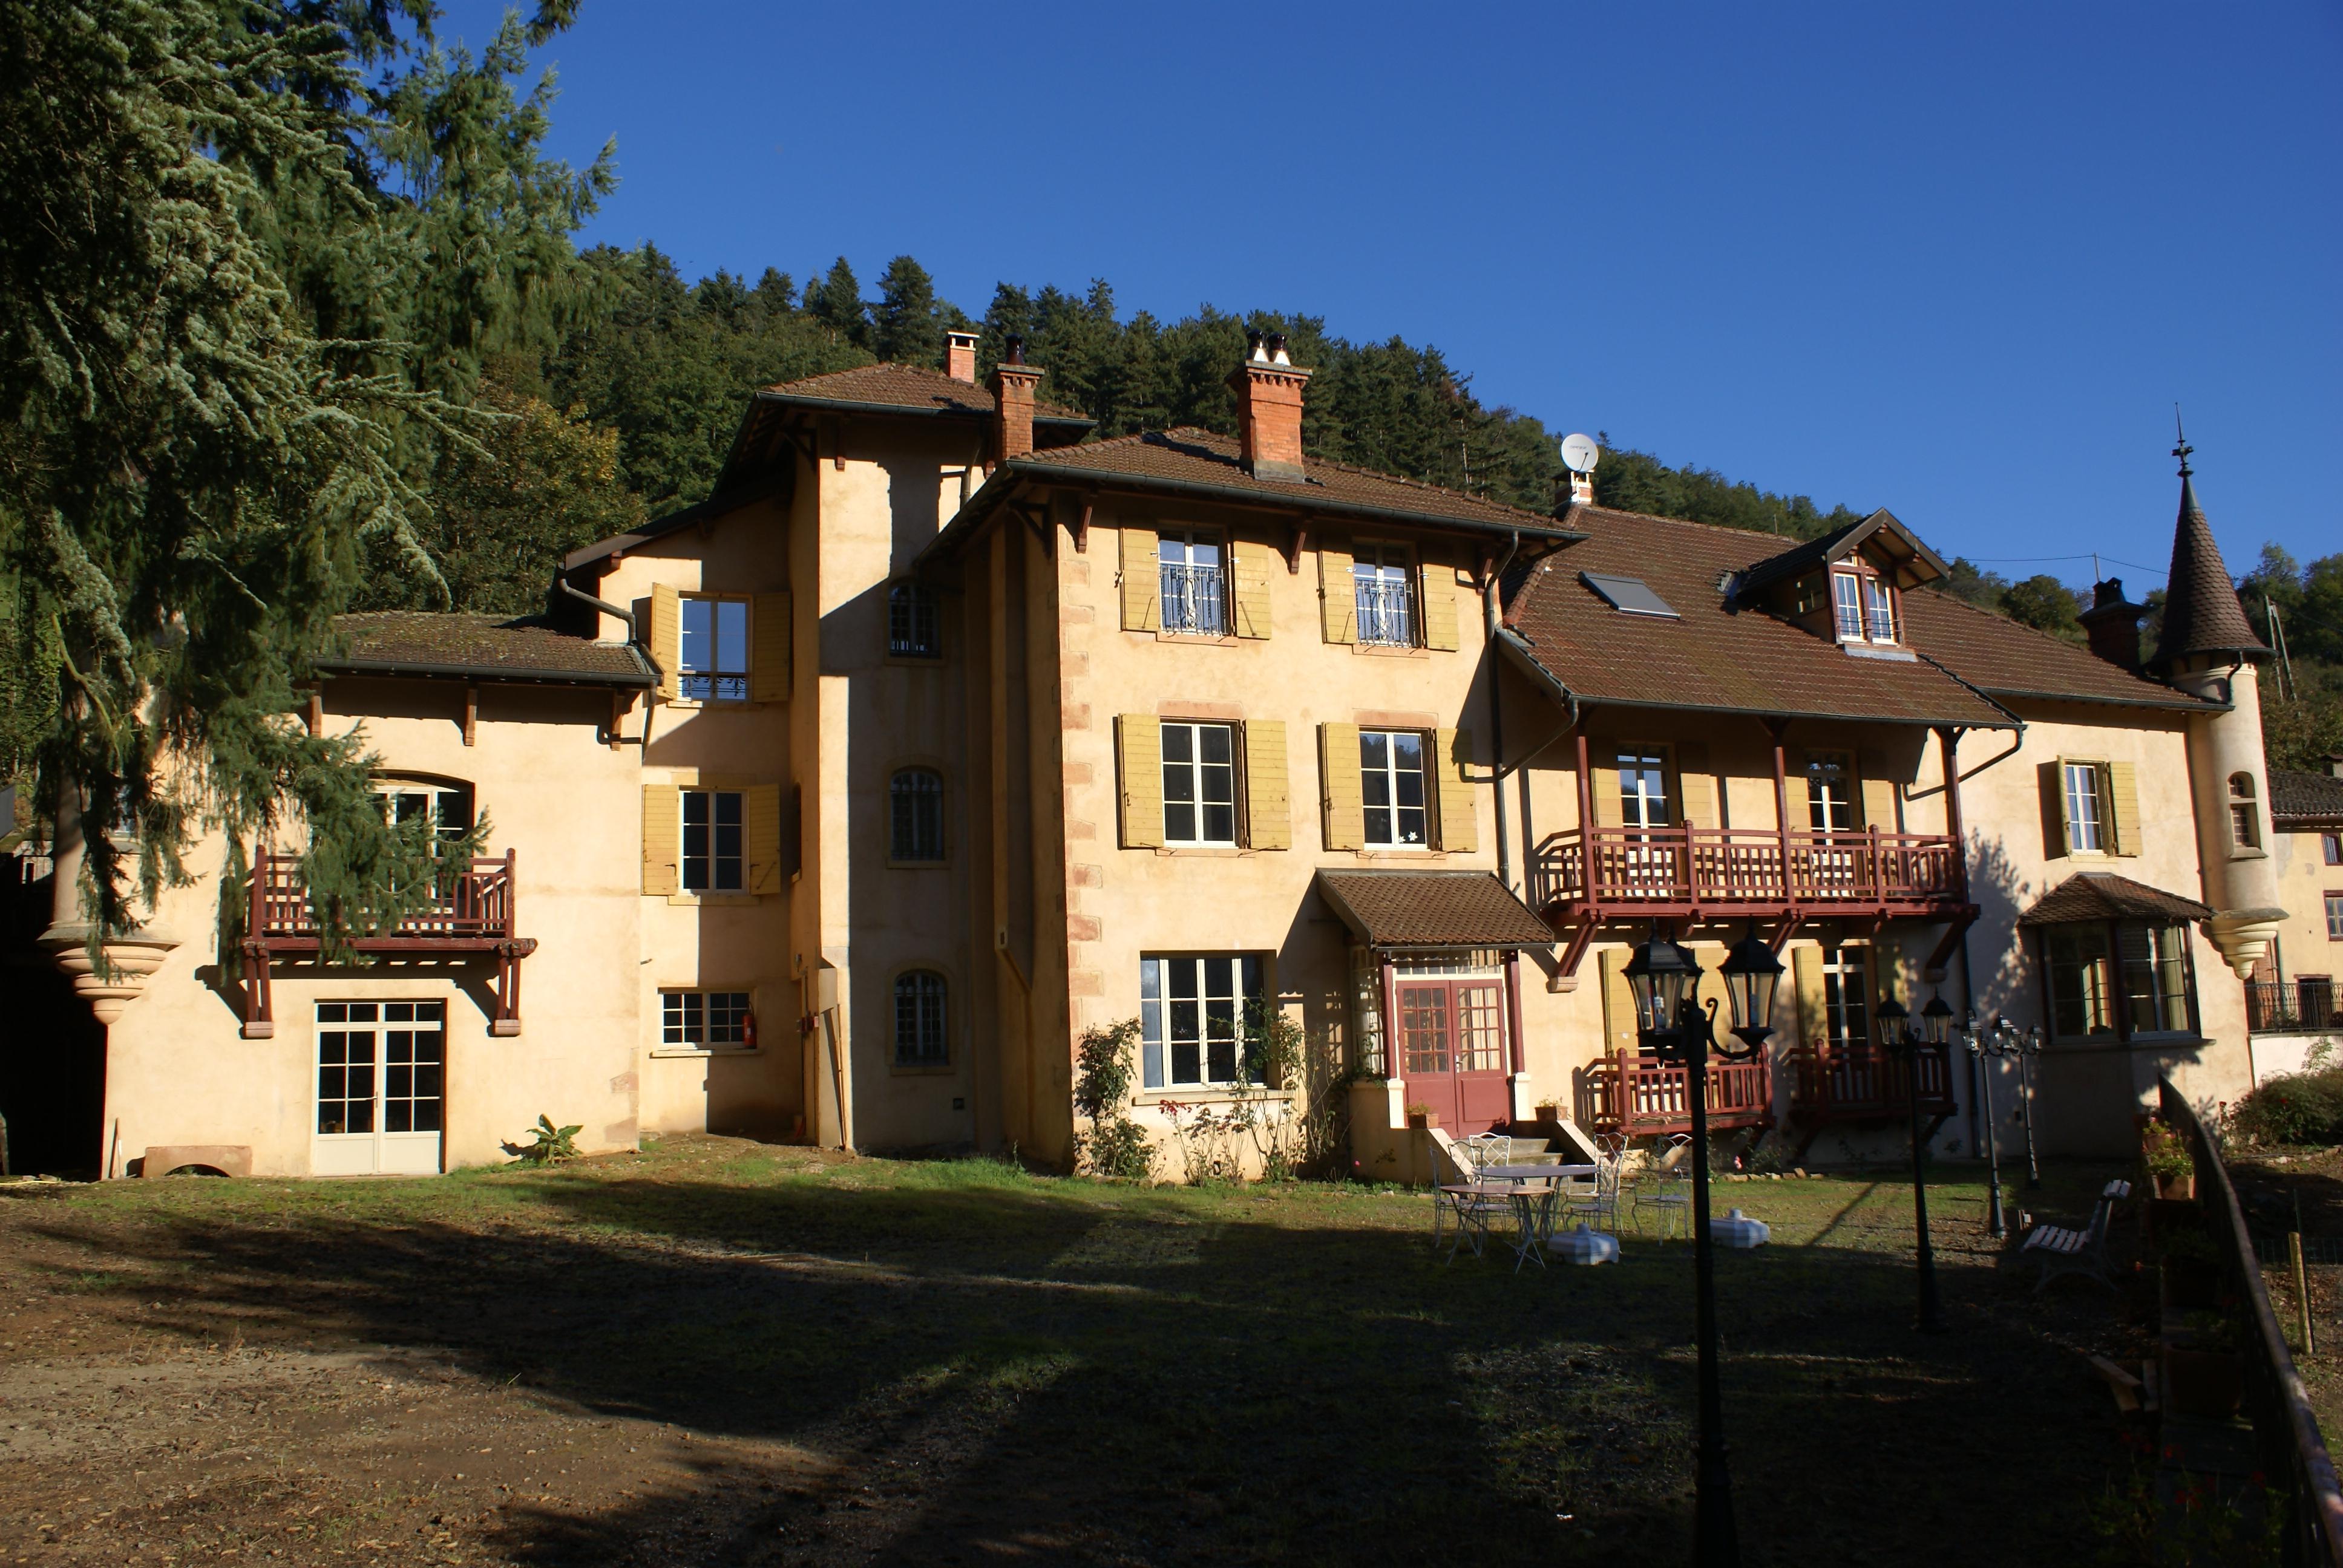 Ch teau de ronzi re beaujolais vert site officiel de l - Site officiel office de tourisme de cauterets ...